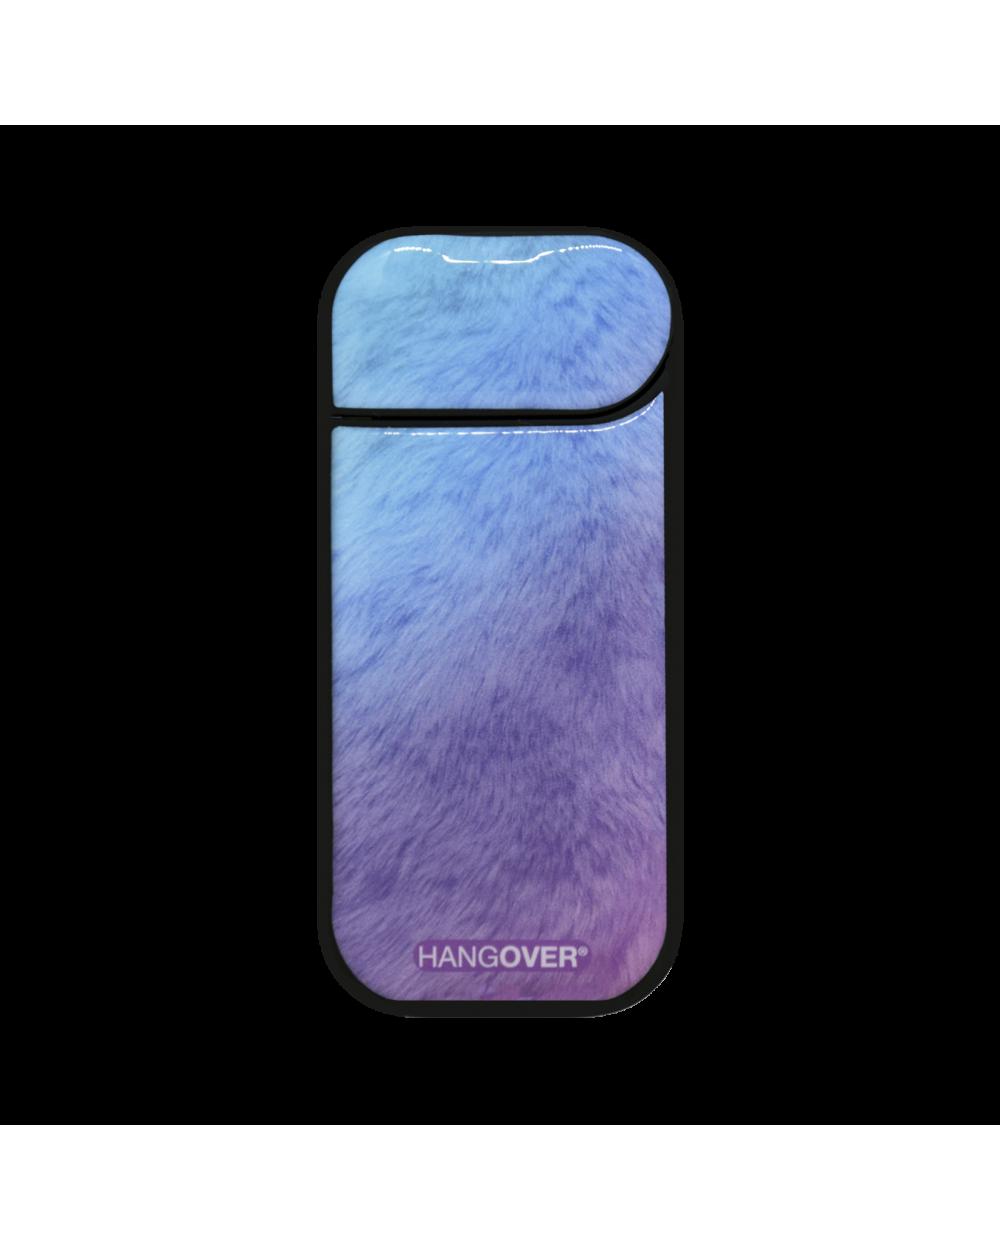 Serenity - Cover SmartSkin Adesiva in Resina Speciale per Iqos 2.4  e 2.4 plus by Hangover